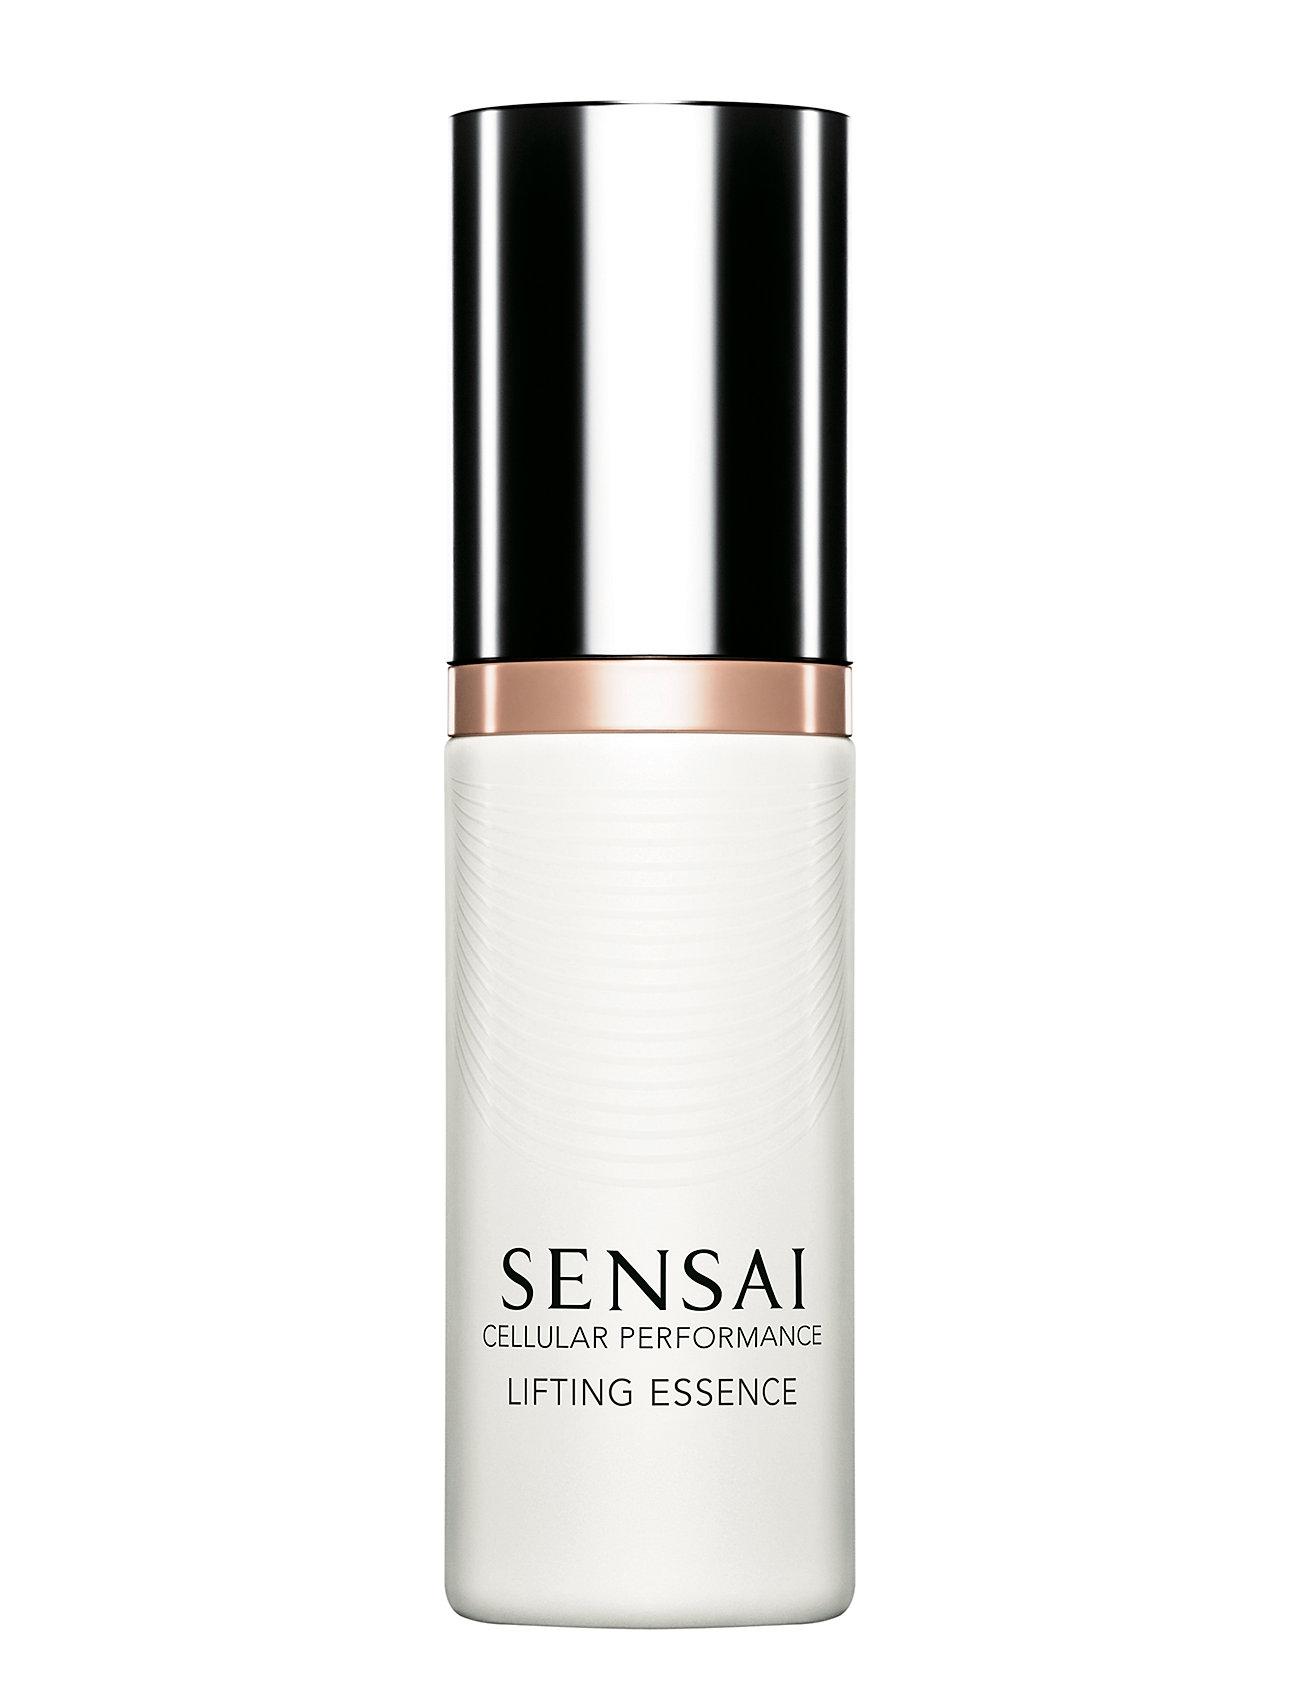 Image of Cellular Performance Lifting Essence Serum Ansigtspleje Multi/mønstret SENSAI (3099186195)